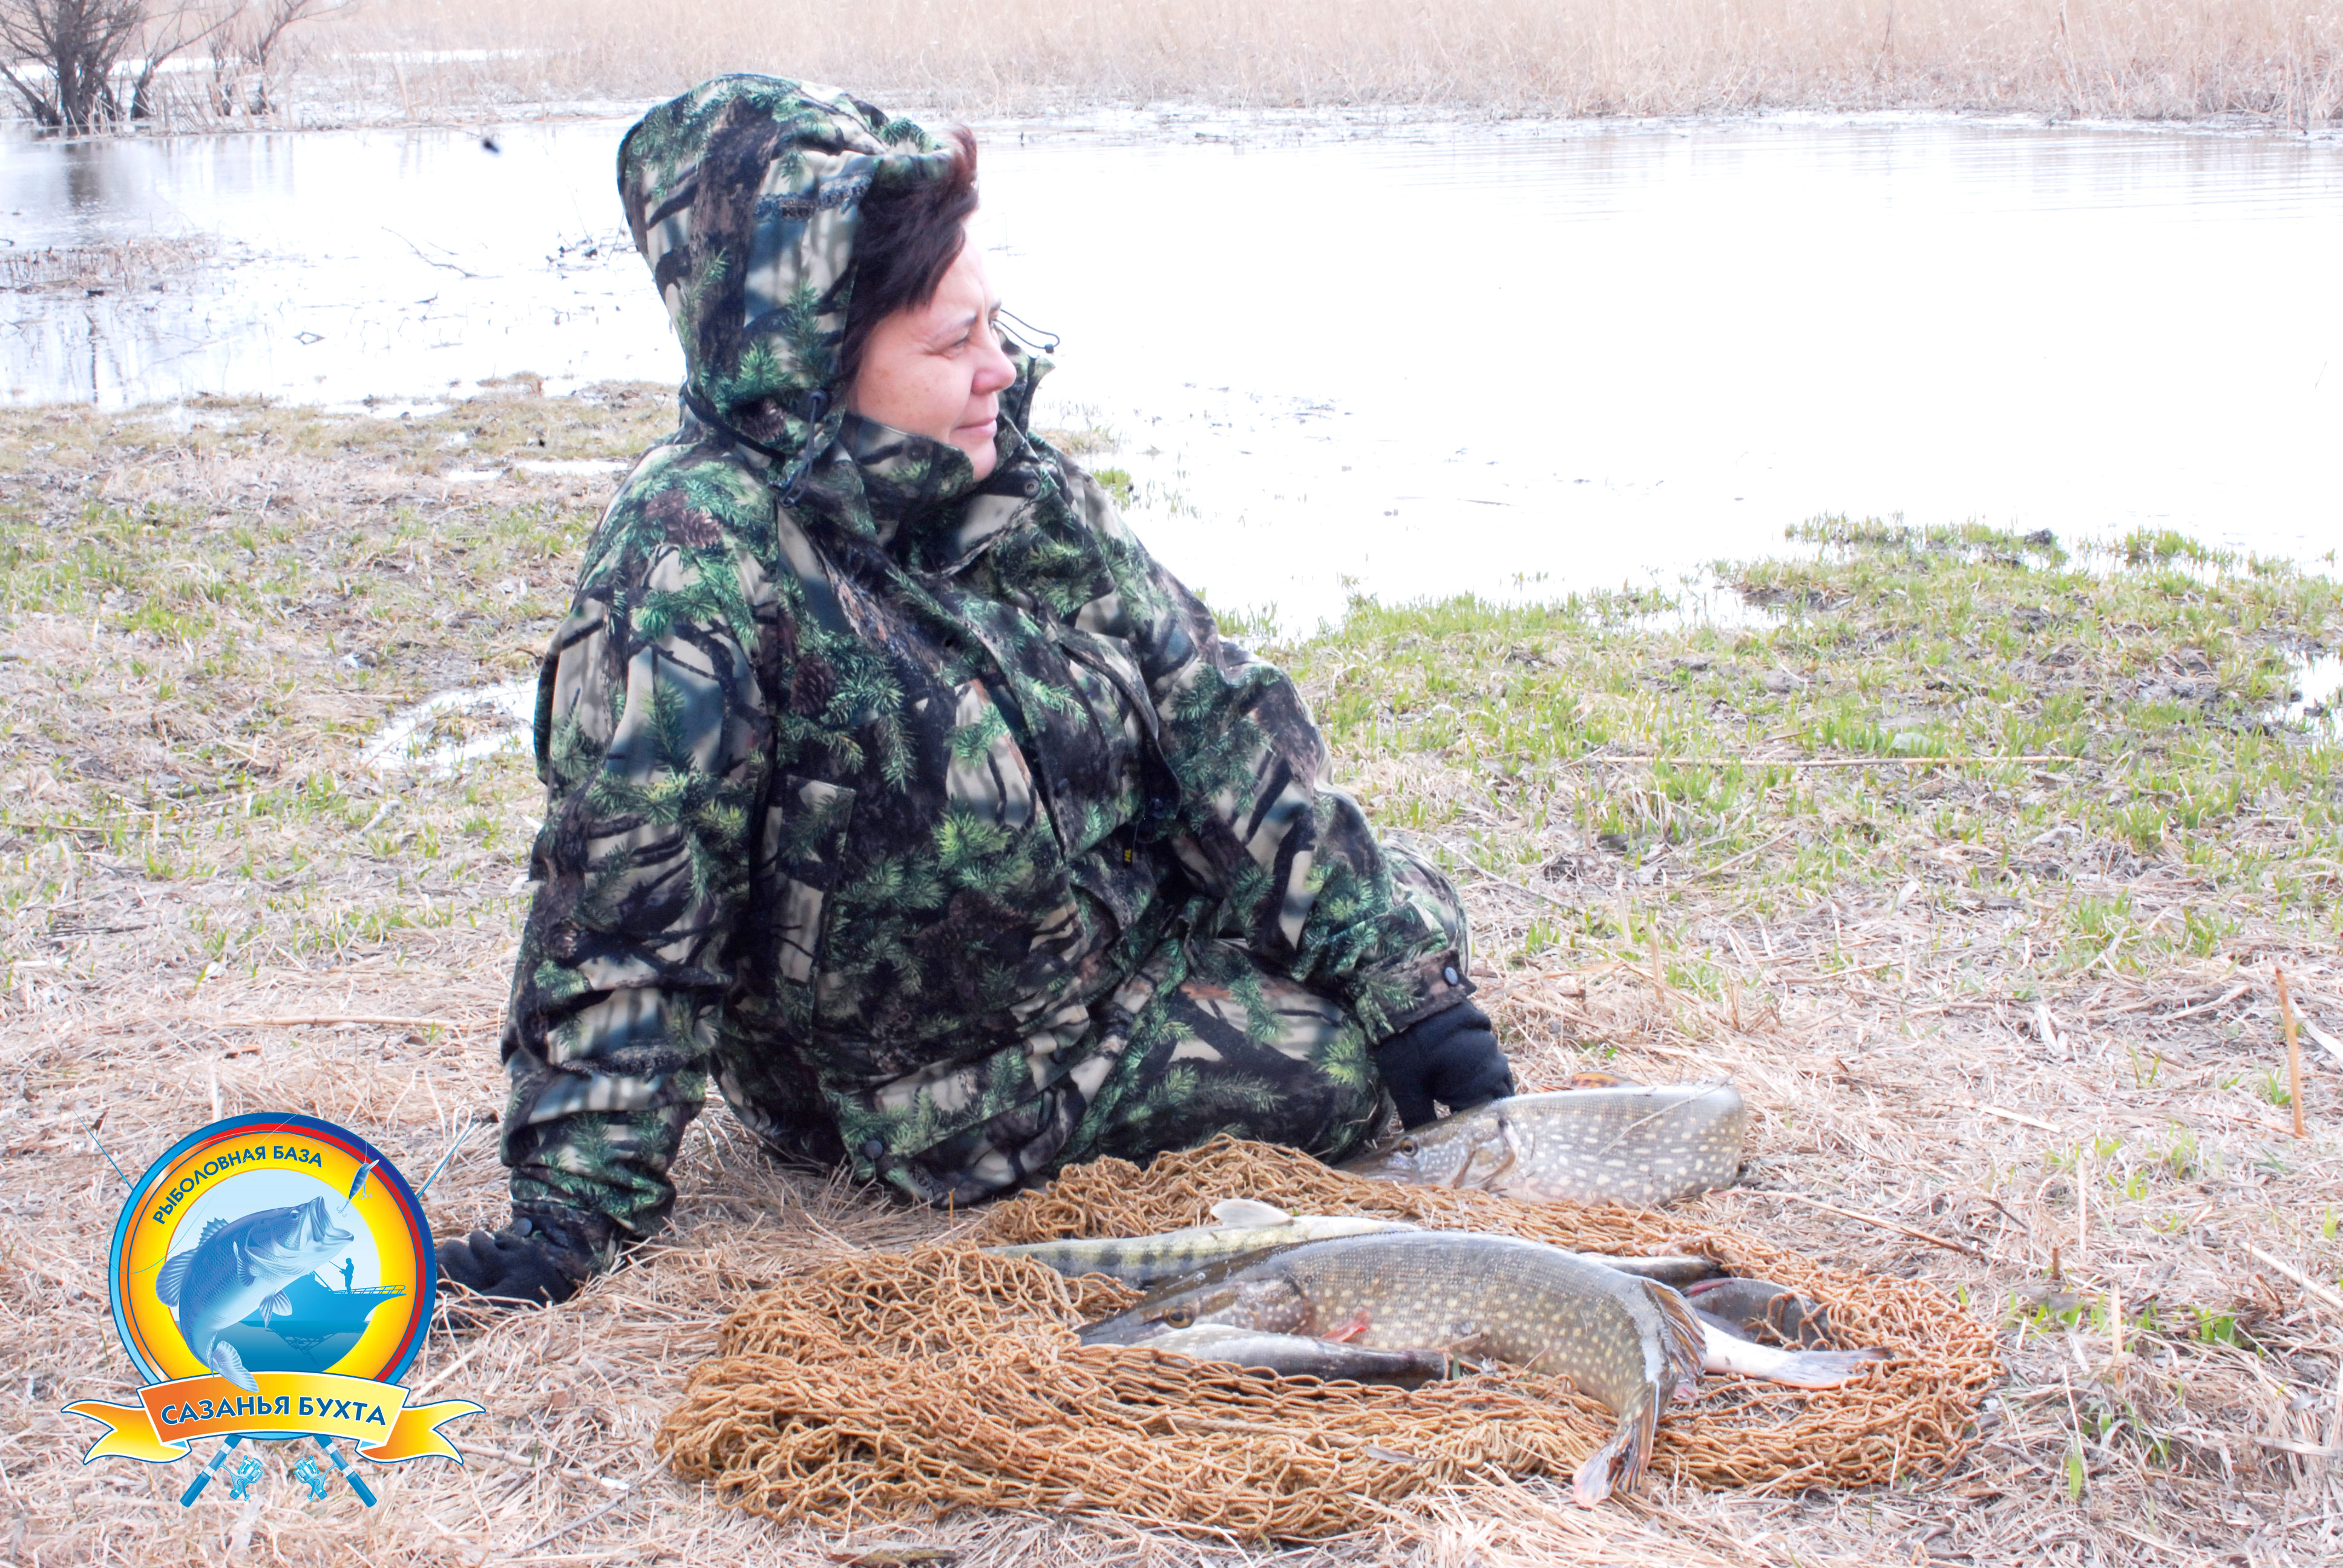 www.sazanya-bukhta.ru/forum/2018/1/2/1.jpg